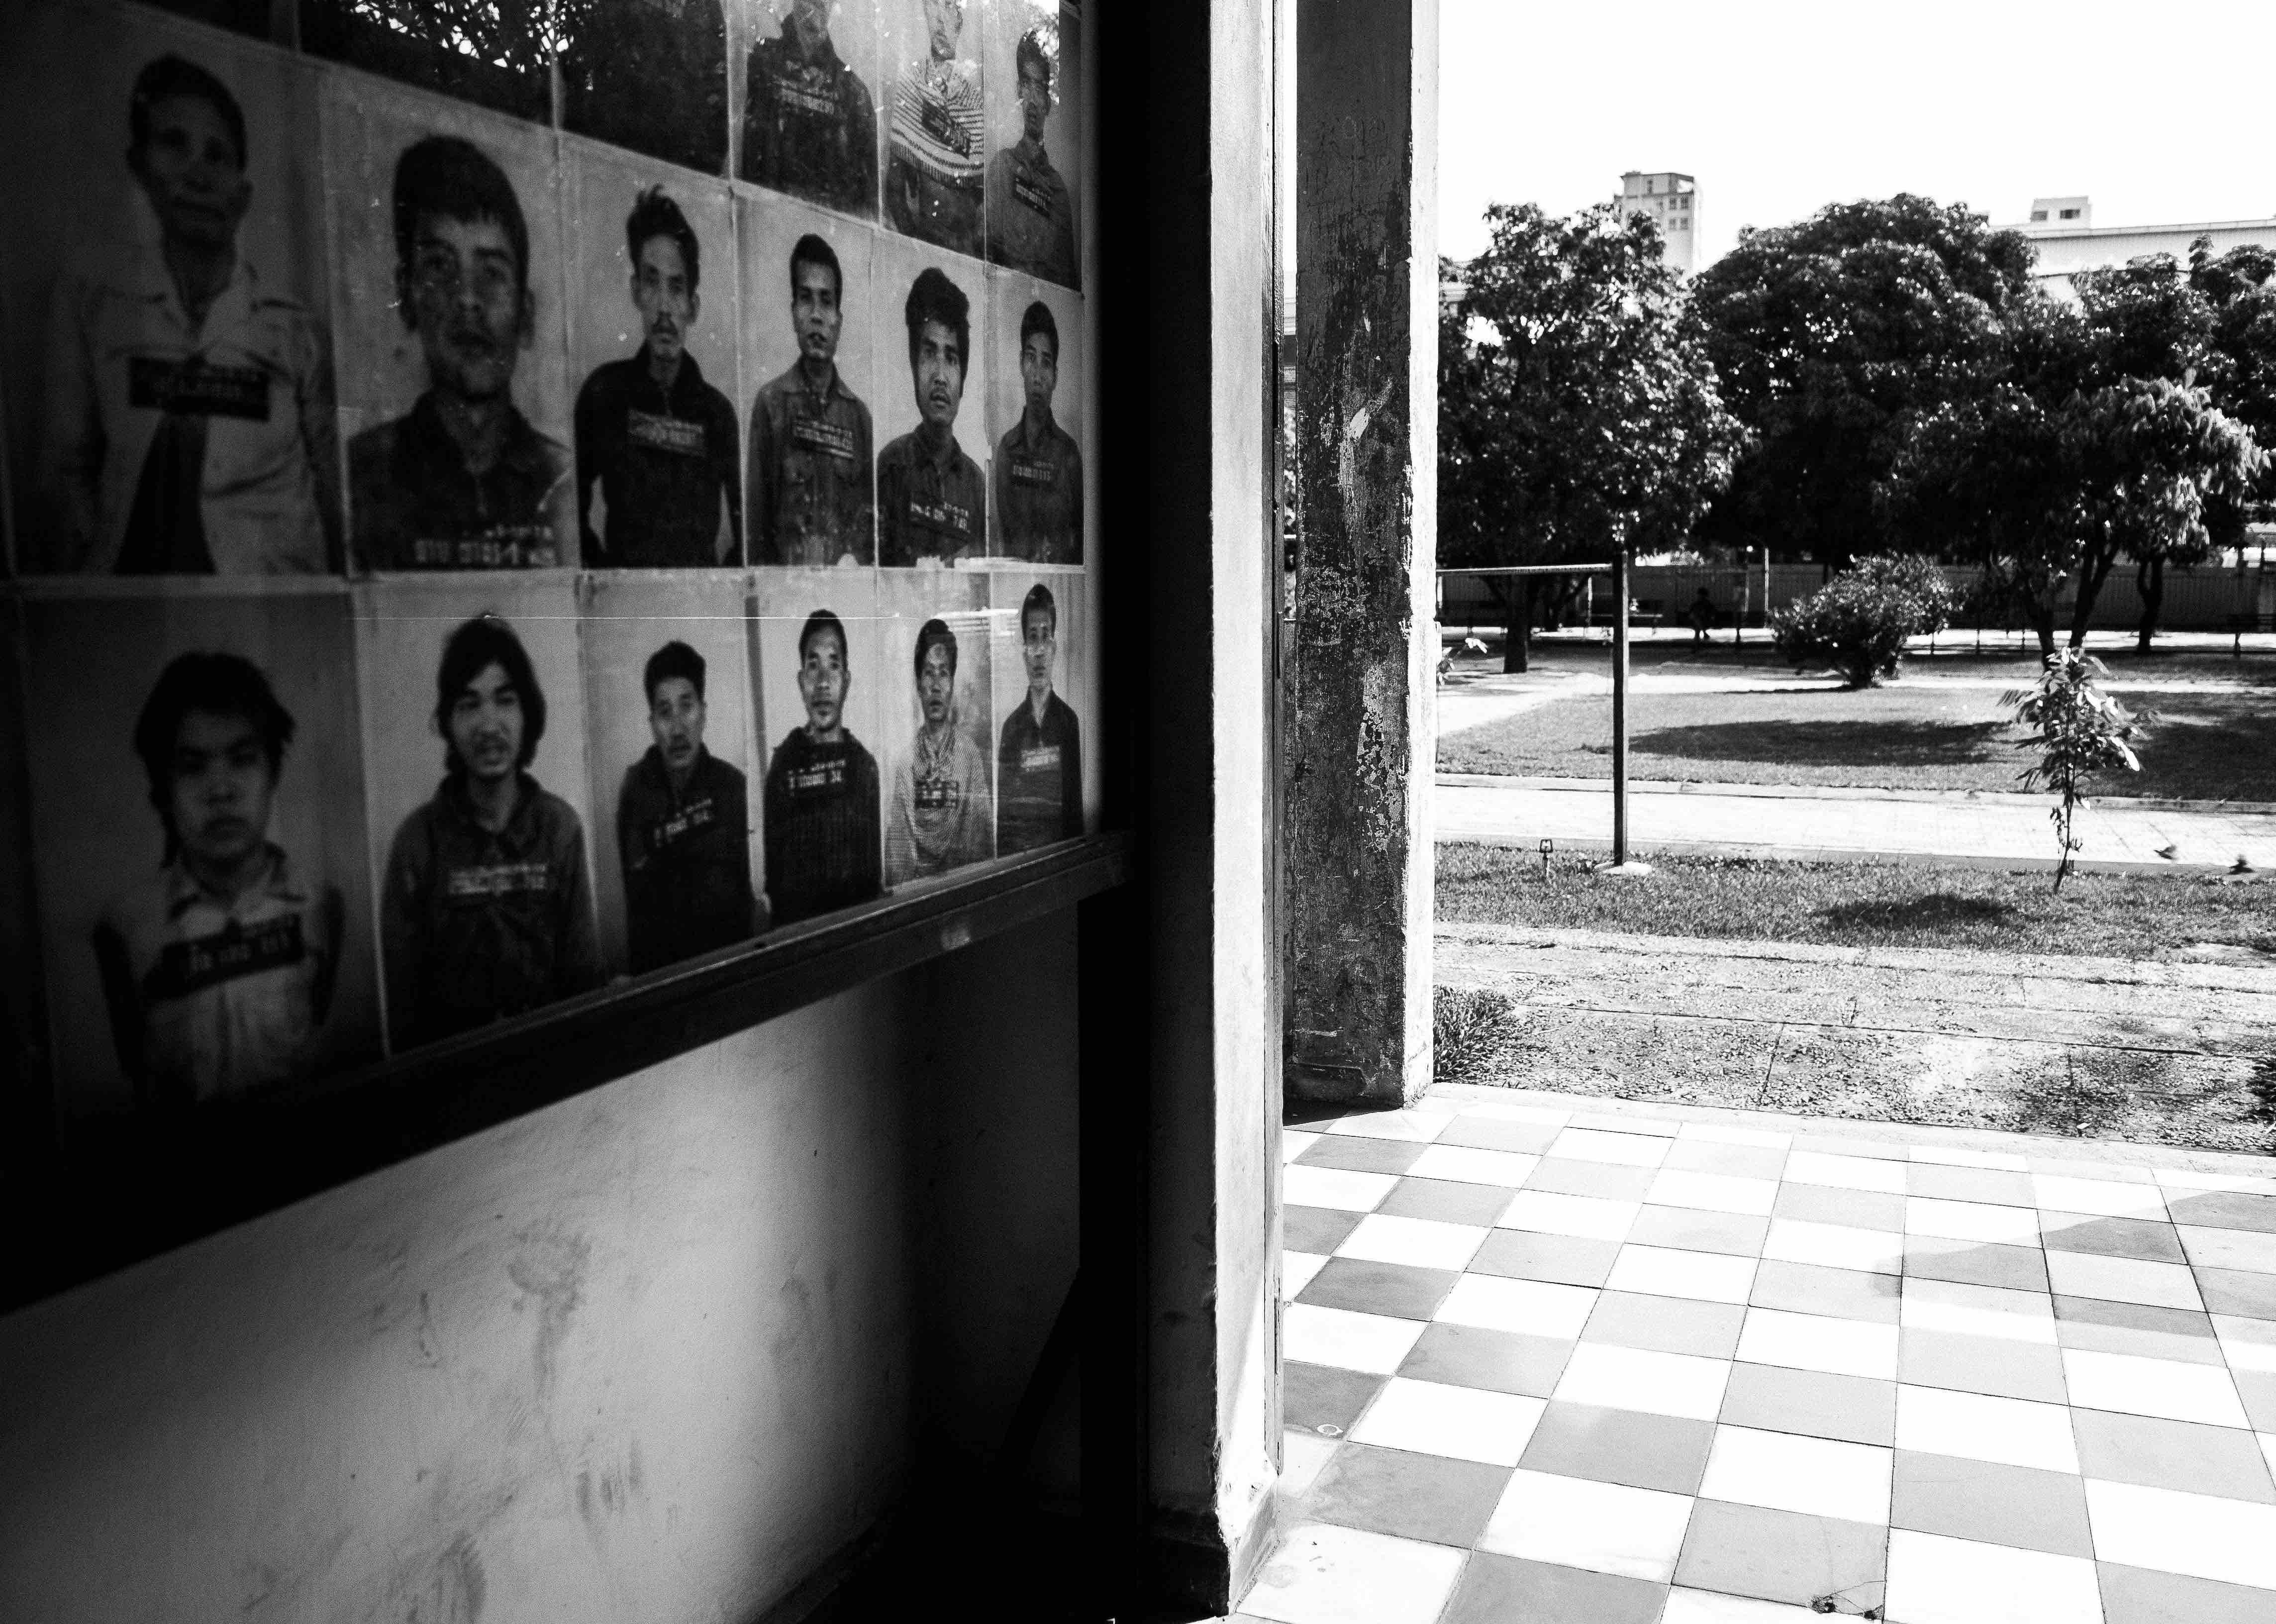 © Alessandro Lorenzelli, Phnom Penh, 2016